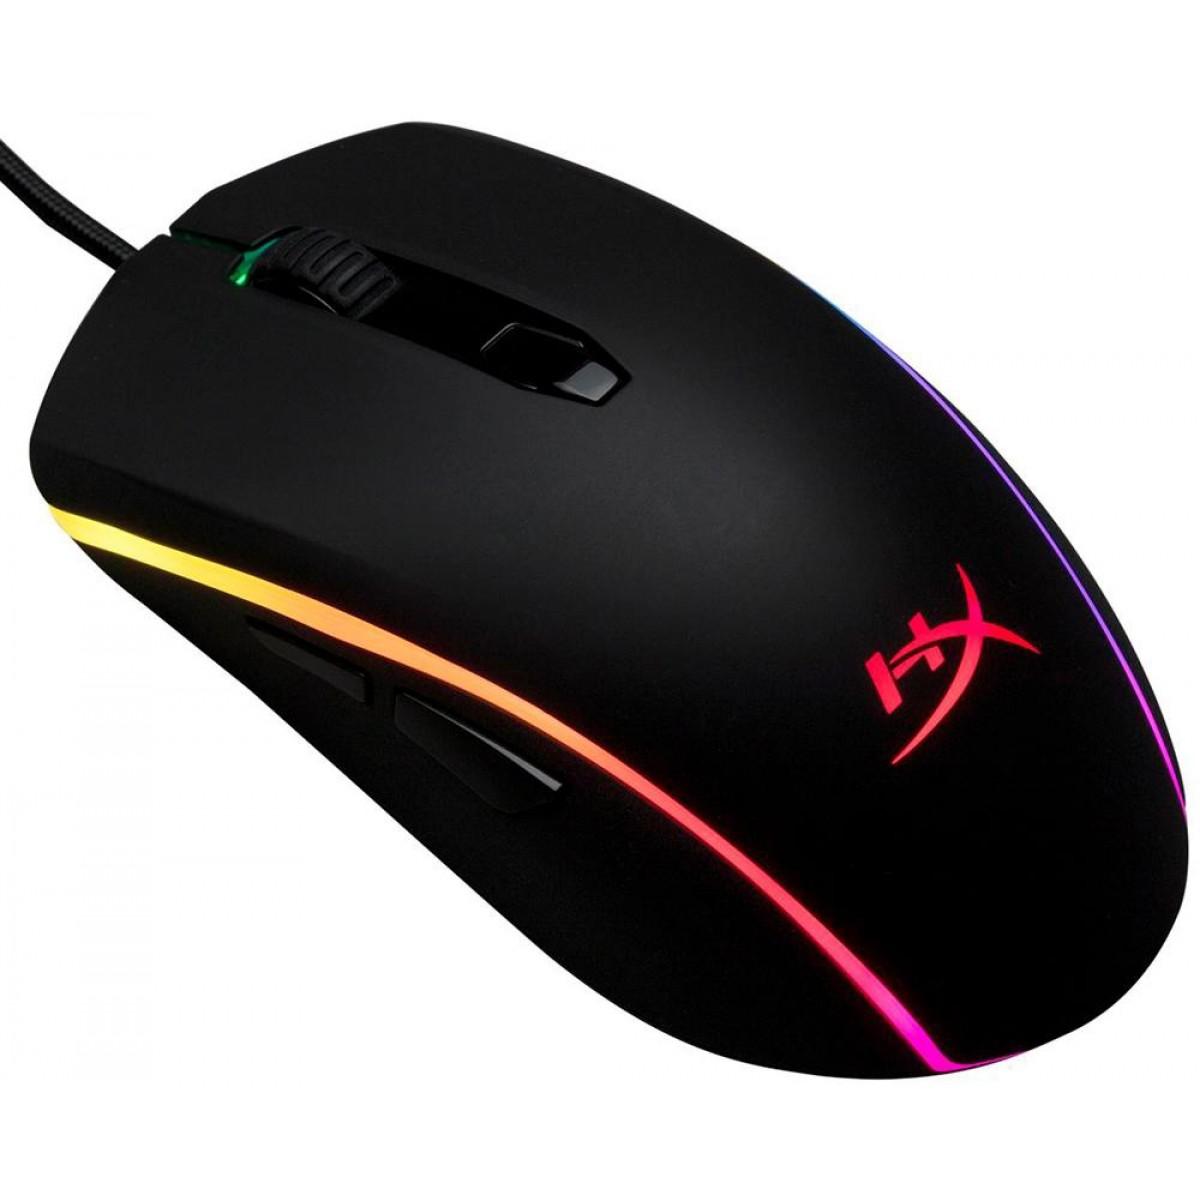 Mouse Gamer HyperX Pulsefire Surge RGB, 16000 DPI, HX-MC002B